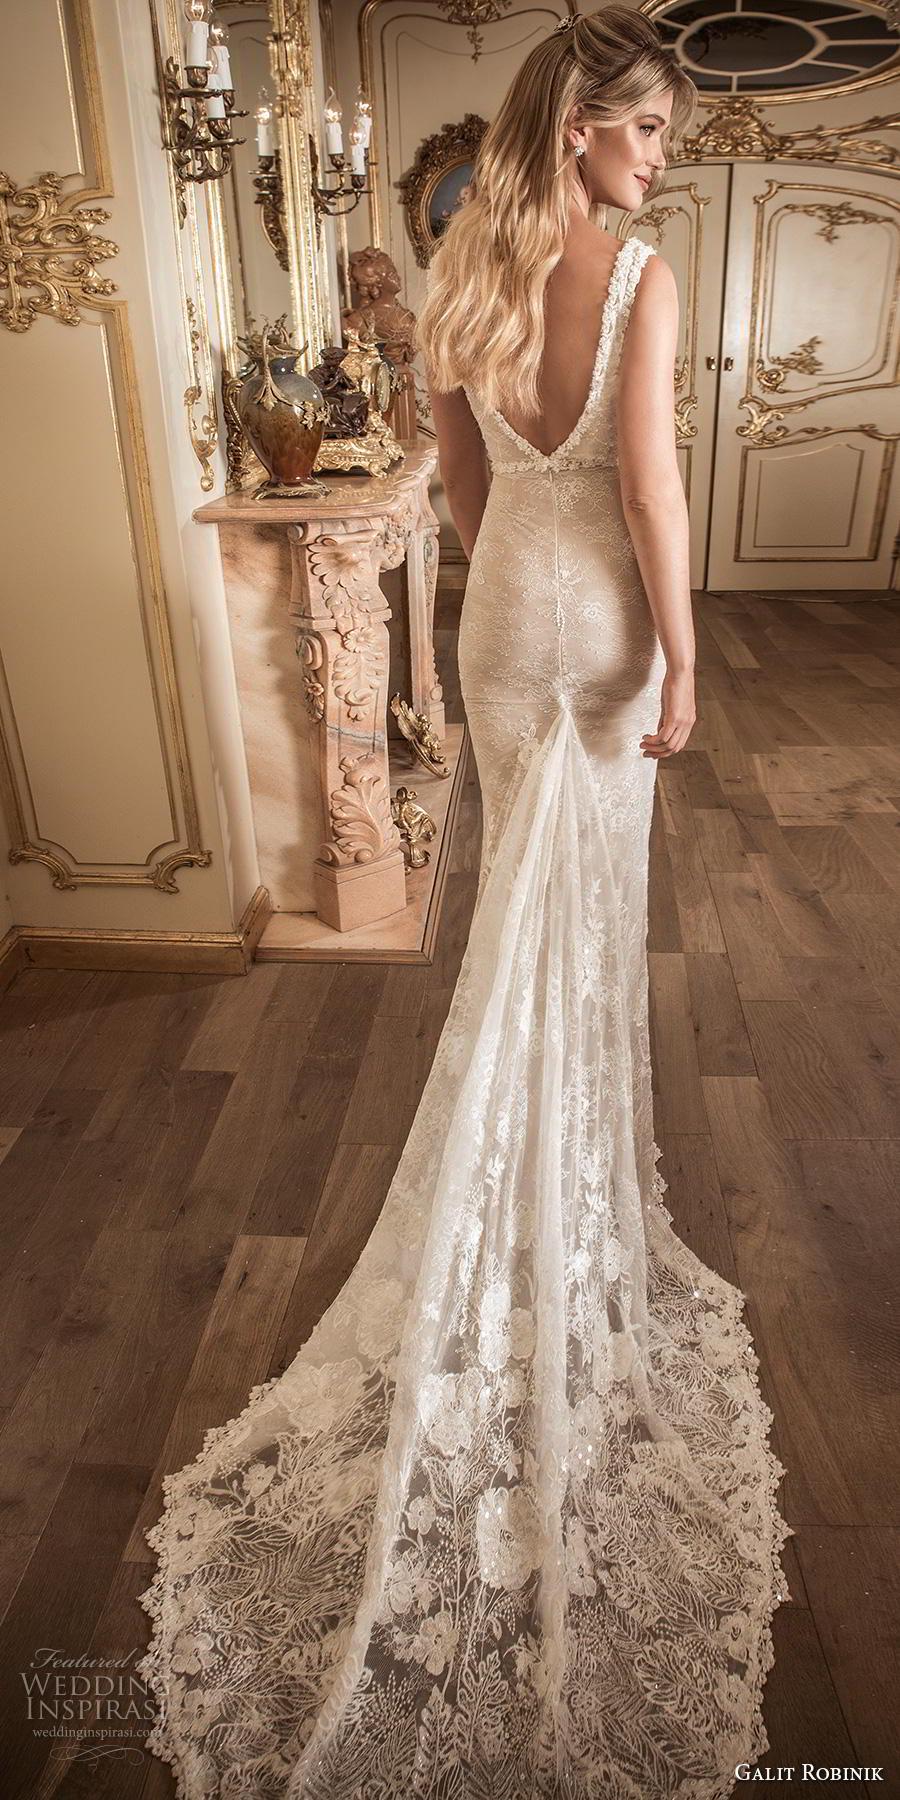 galit robinik 2019 bridal sleeveless with strap deep plunging v neck full embellishment elegant fit and flare sheath wedding dress backless v back chapel train (10) bv